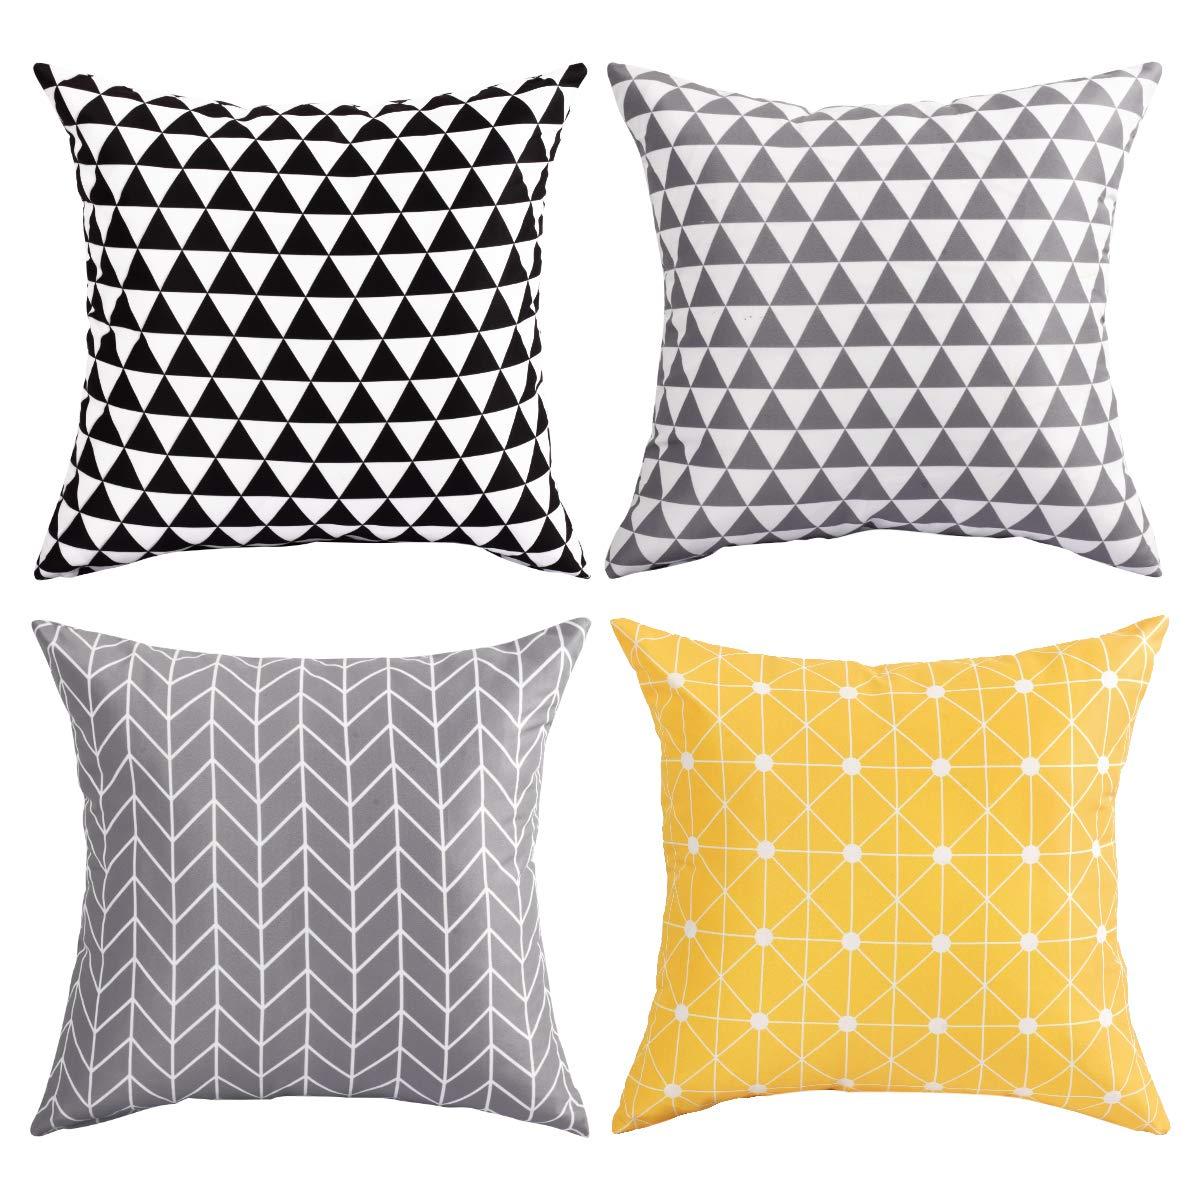 BLEUM CADE Decorative Throw Pillow Cover Case Cushion Modern Decorative for Sofa Couch Bed Car Set Stripes Geometric Home Decor 4 Packs 18 x 18 inch